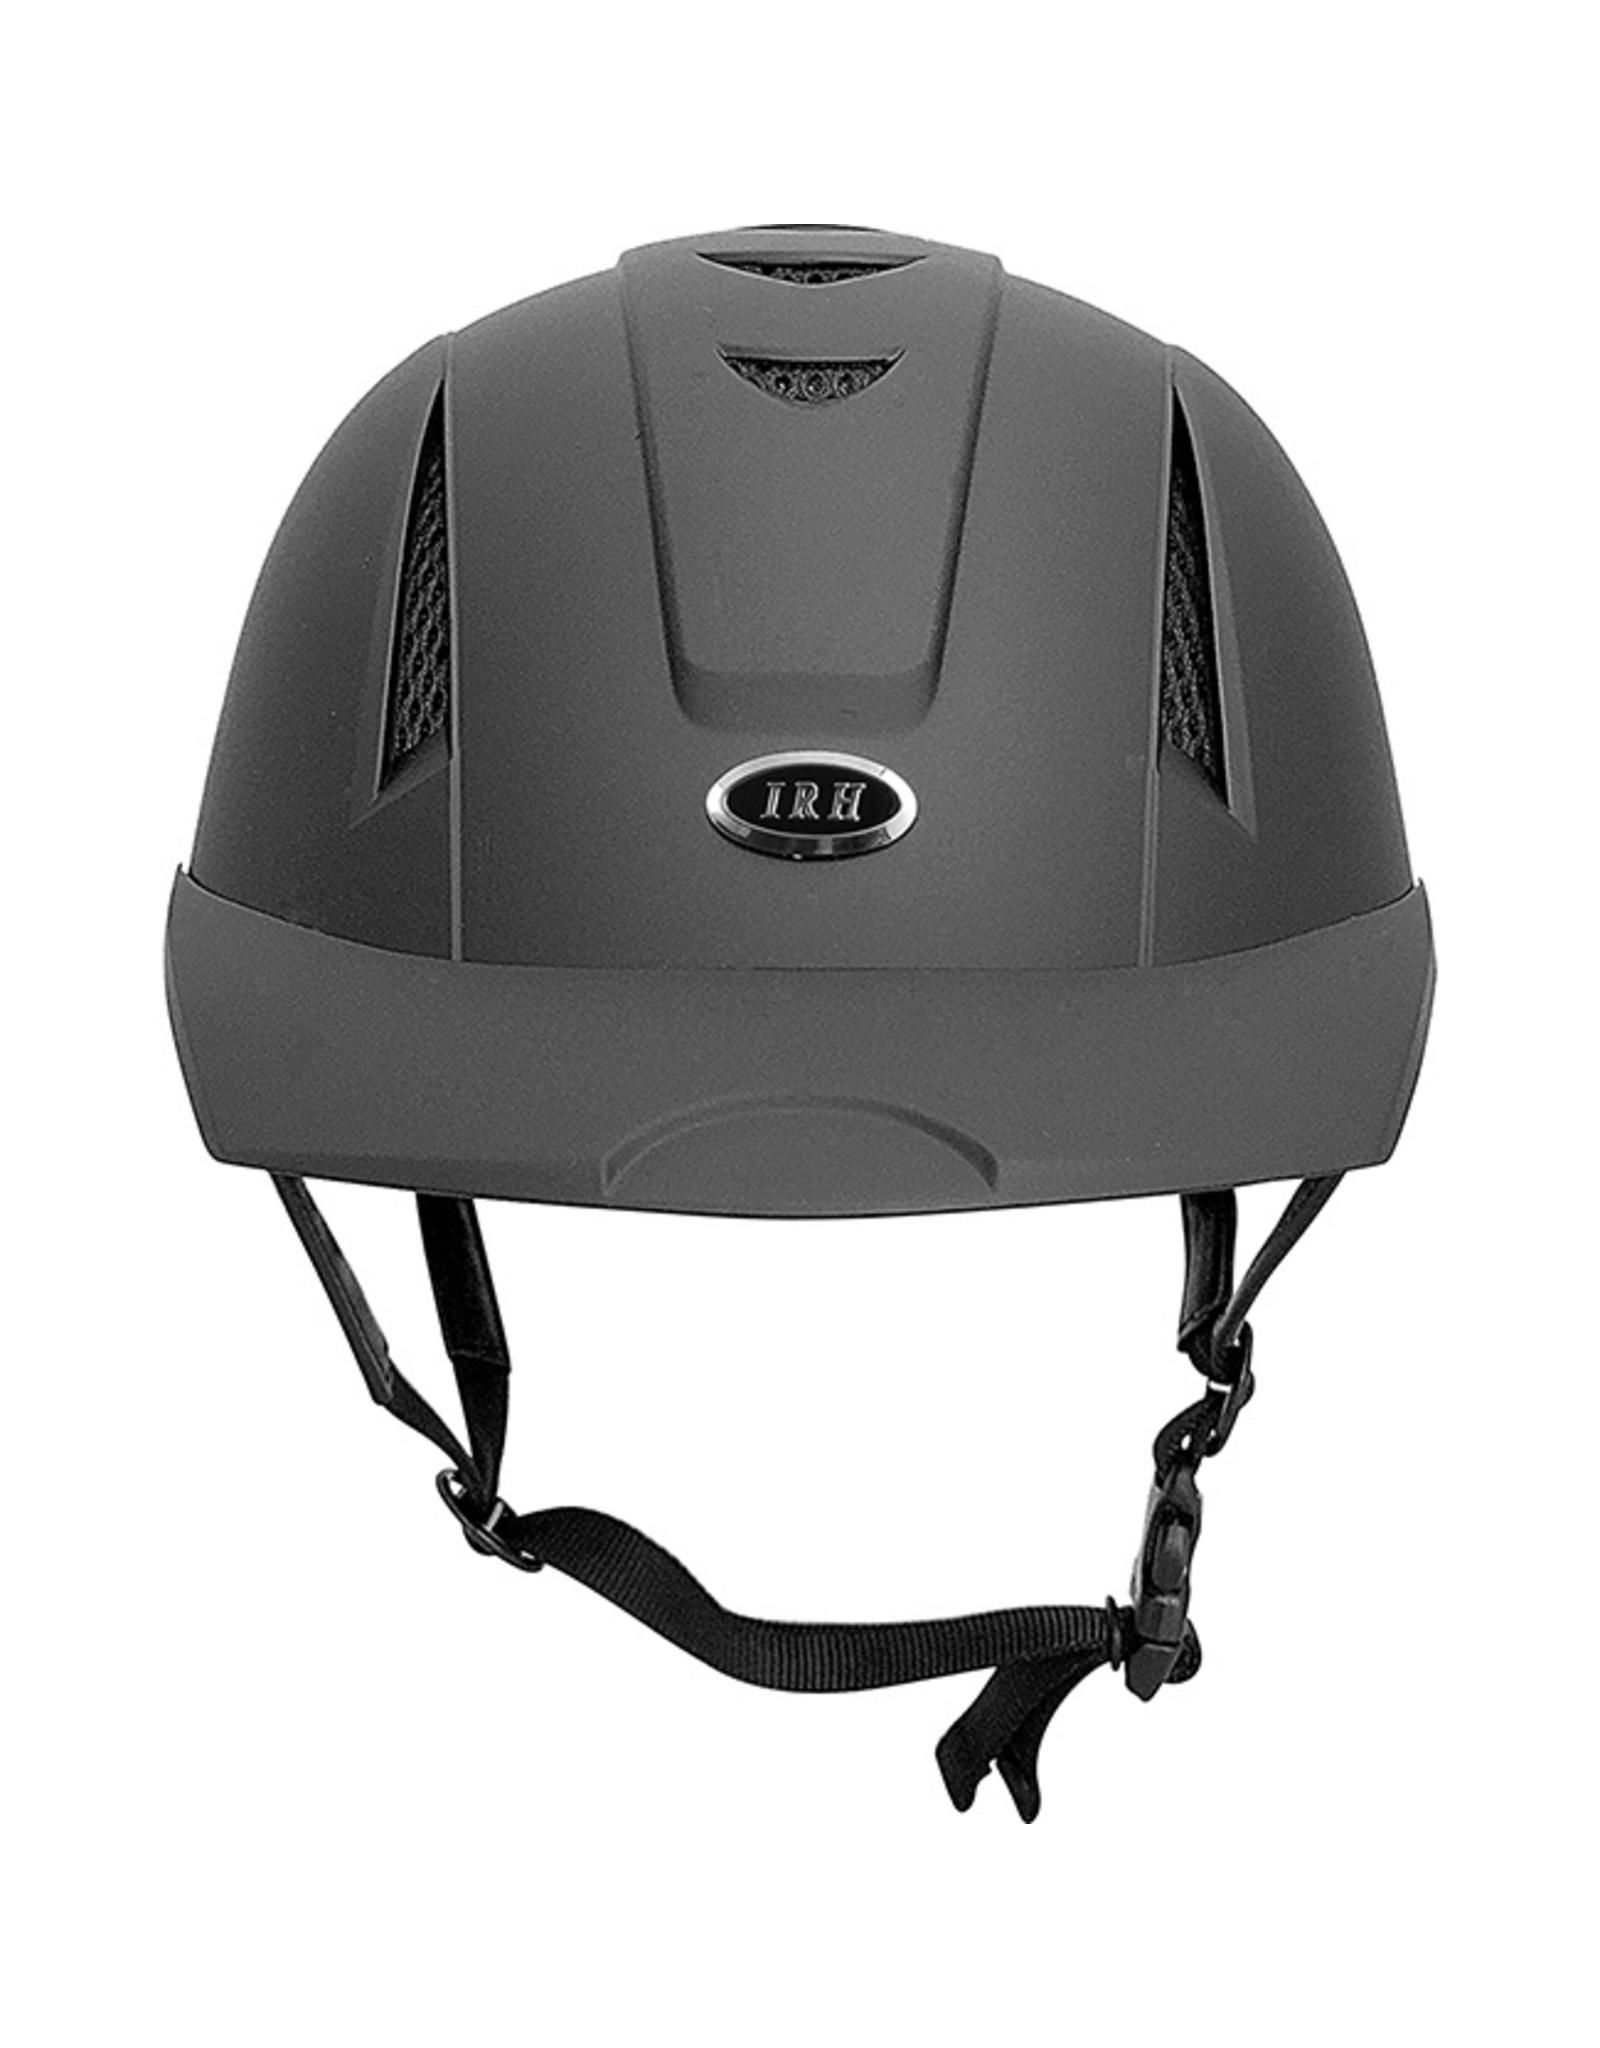 IRH Equi-Pro II Helmet